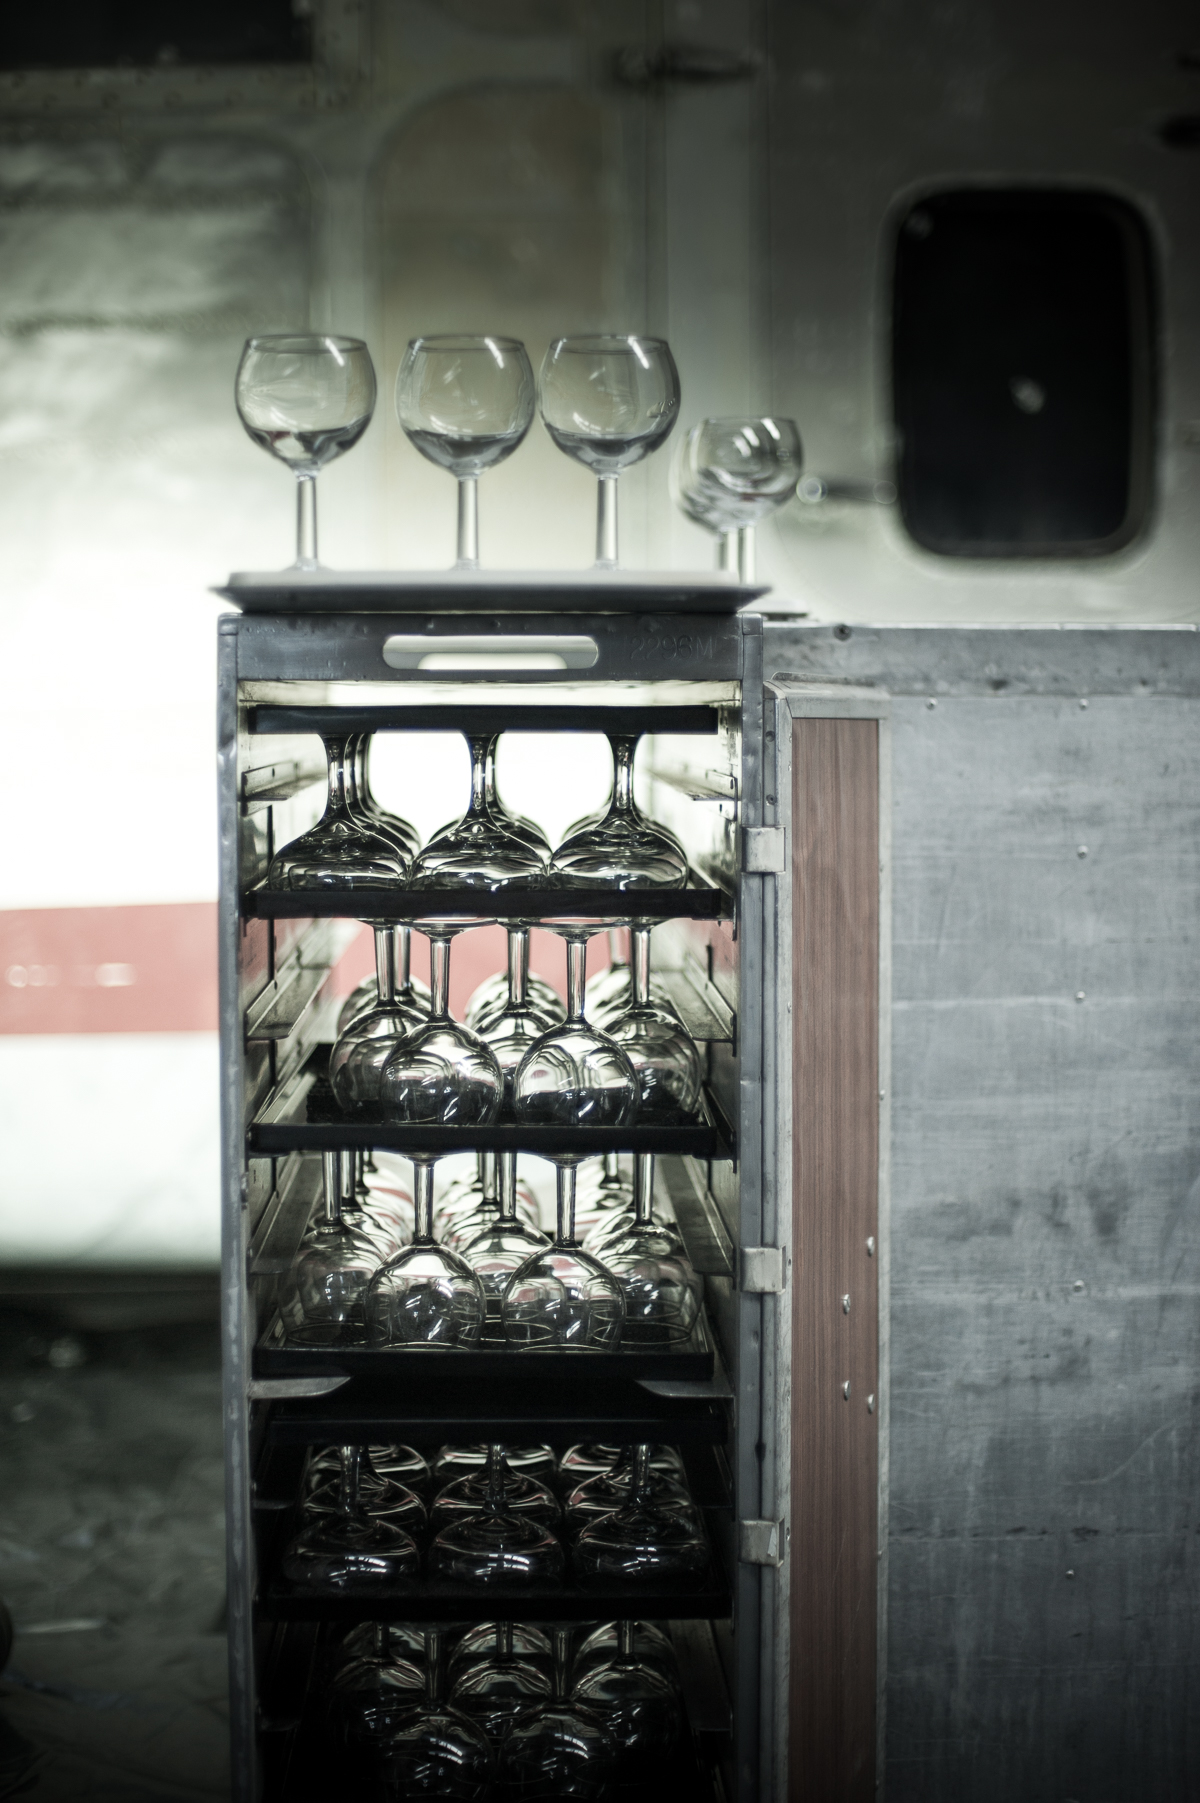 mobile bar hire sydney wine glass hire.jpg